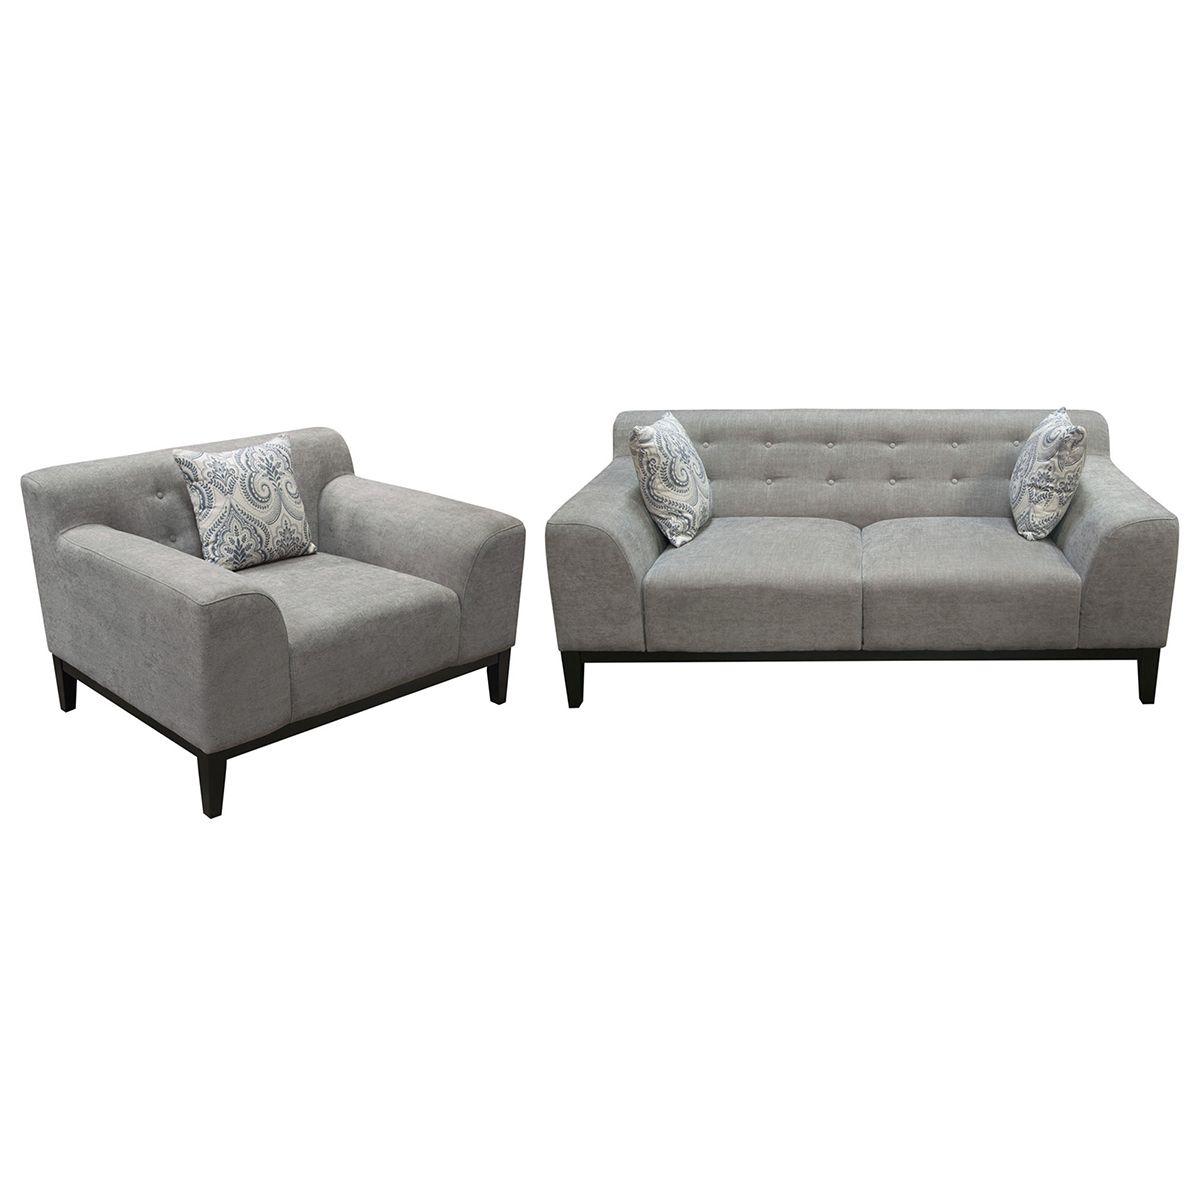 Diamond Sofa Marquee Sofa Chair Set Tufted Moonstone Fabric